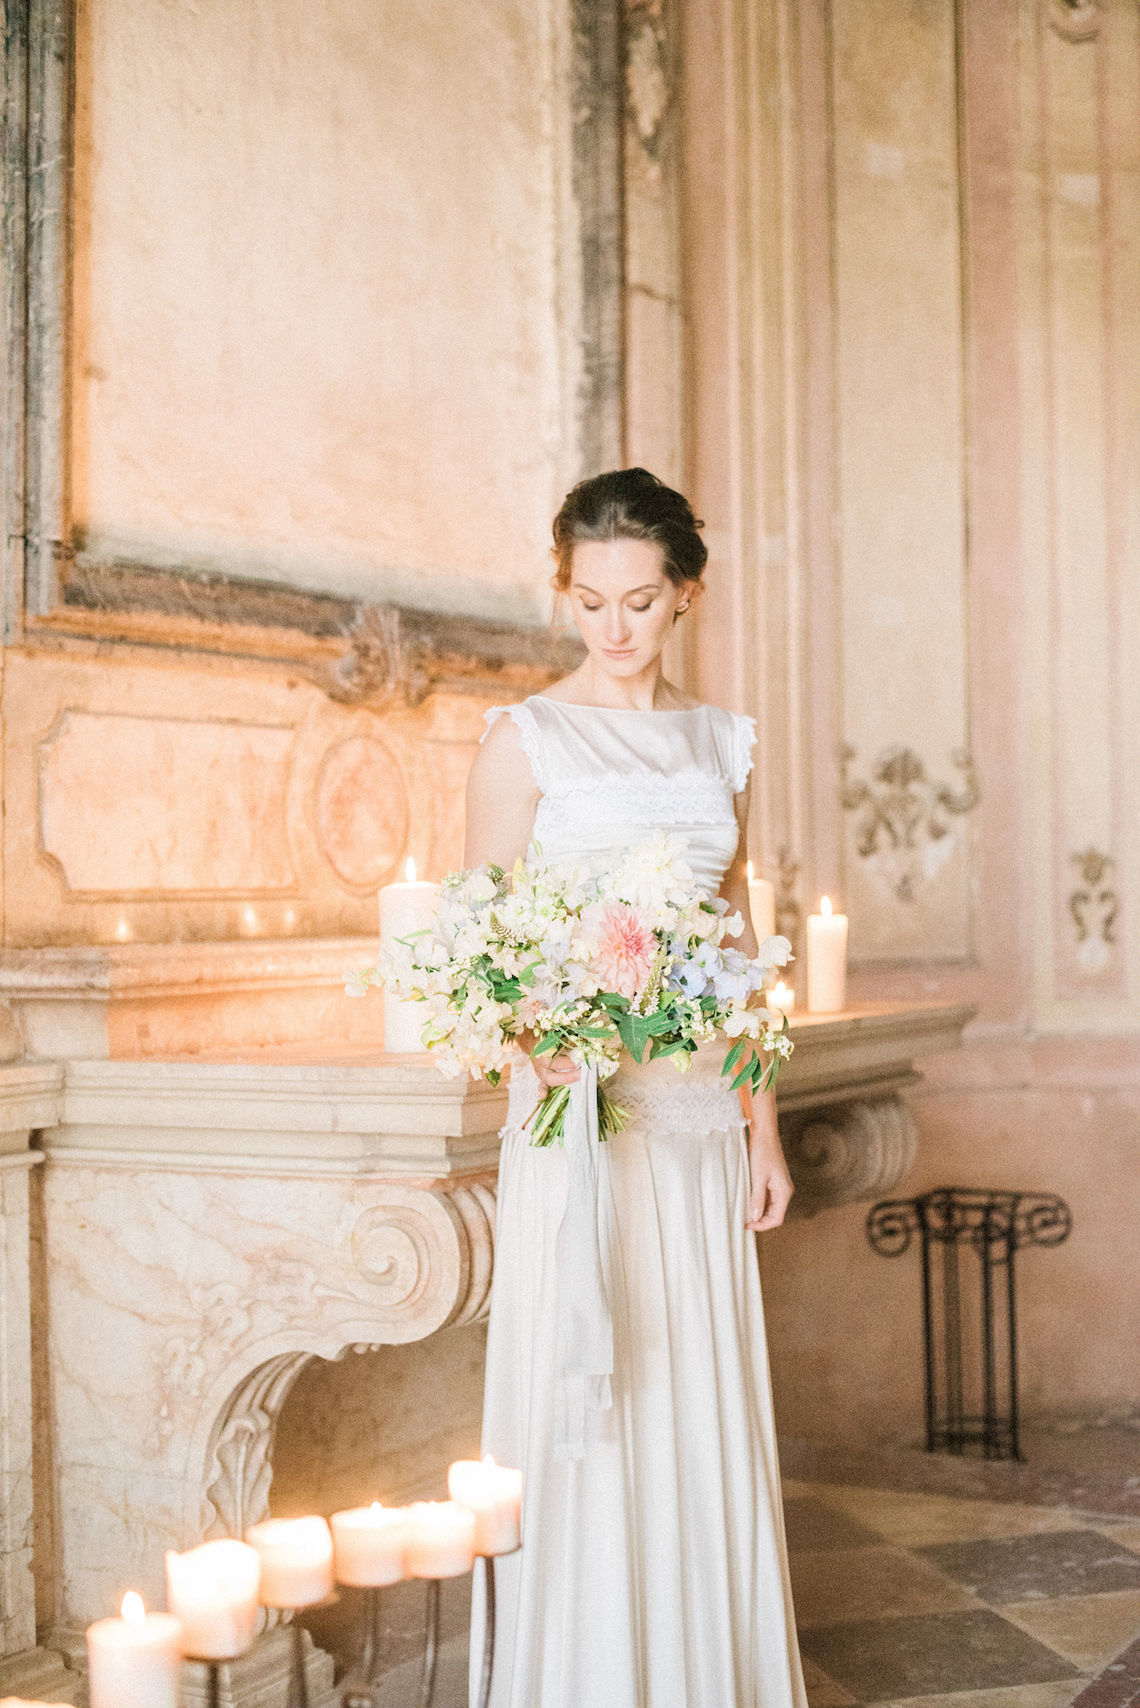 Ornate Candelit Peach & Blue Wedding Inspiration | Gabriela Jarkovska 38